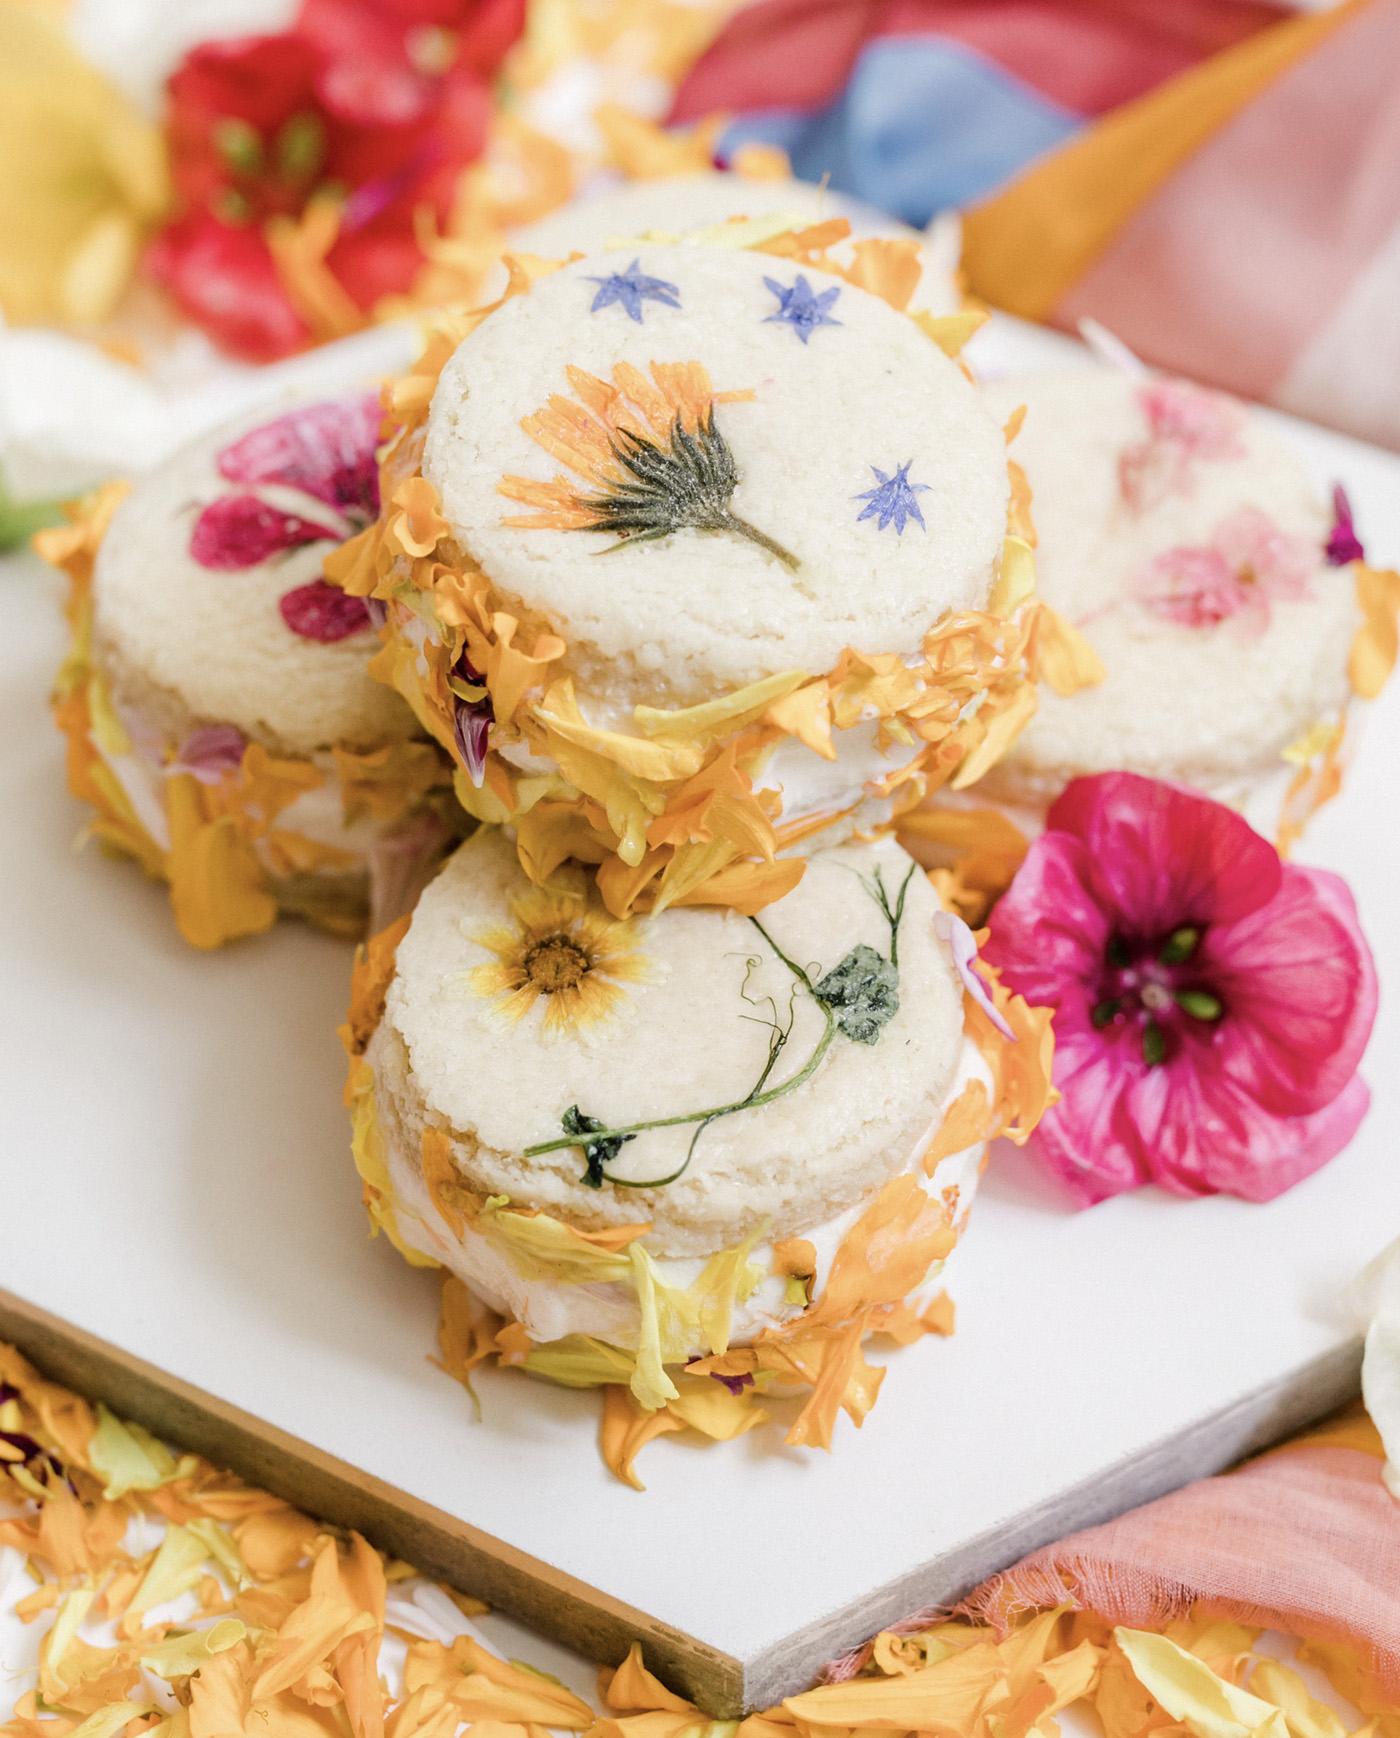 floral ice cream sandwich